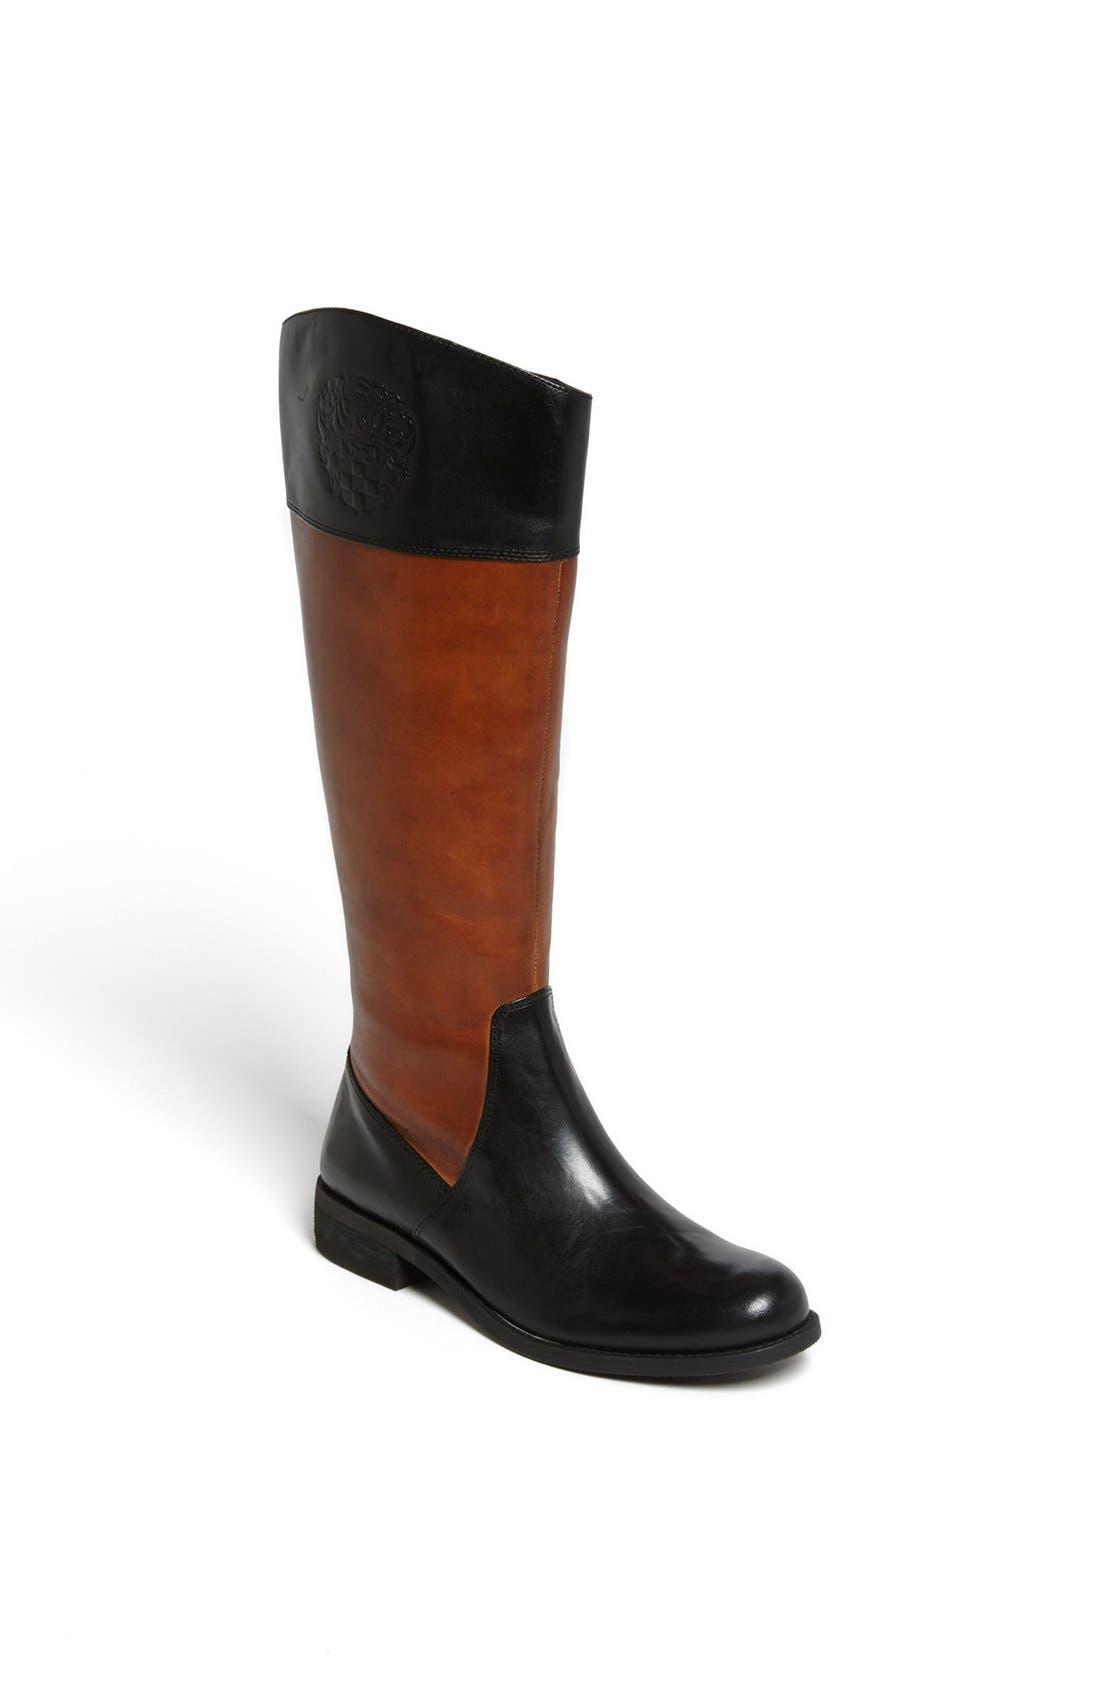 Alternate Image 1 Selected - Vince Camuto 'Kellini' Boot